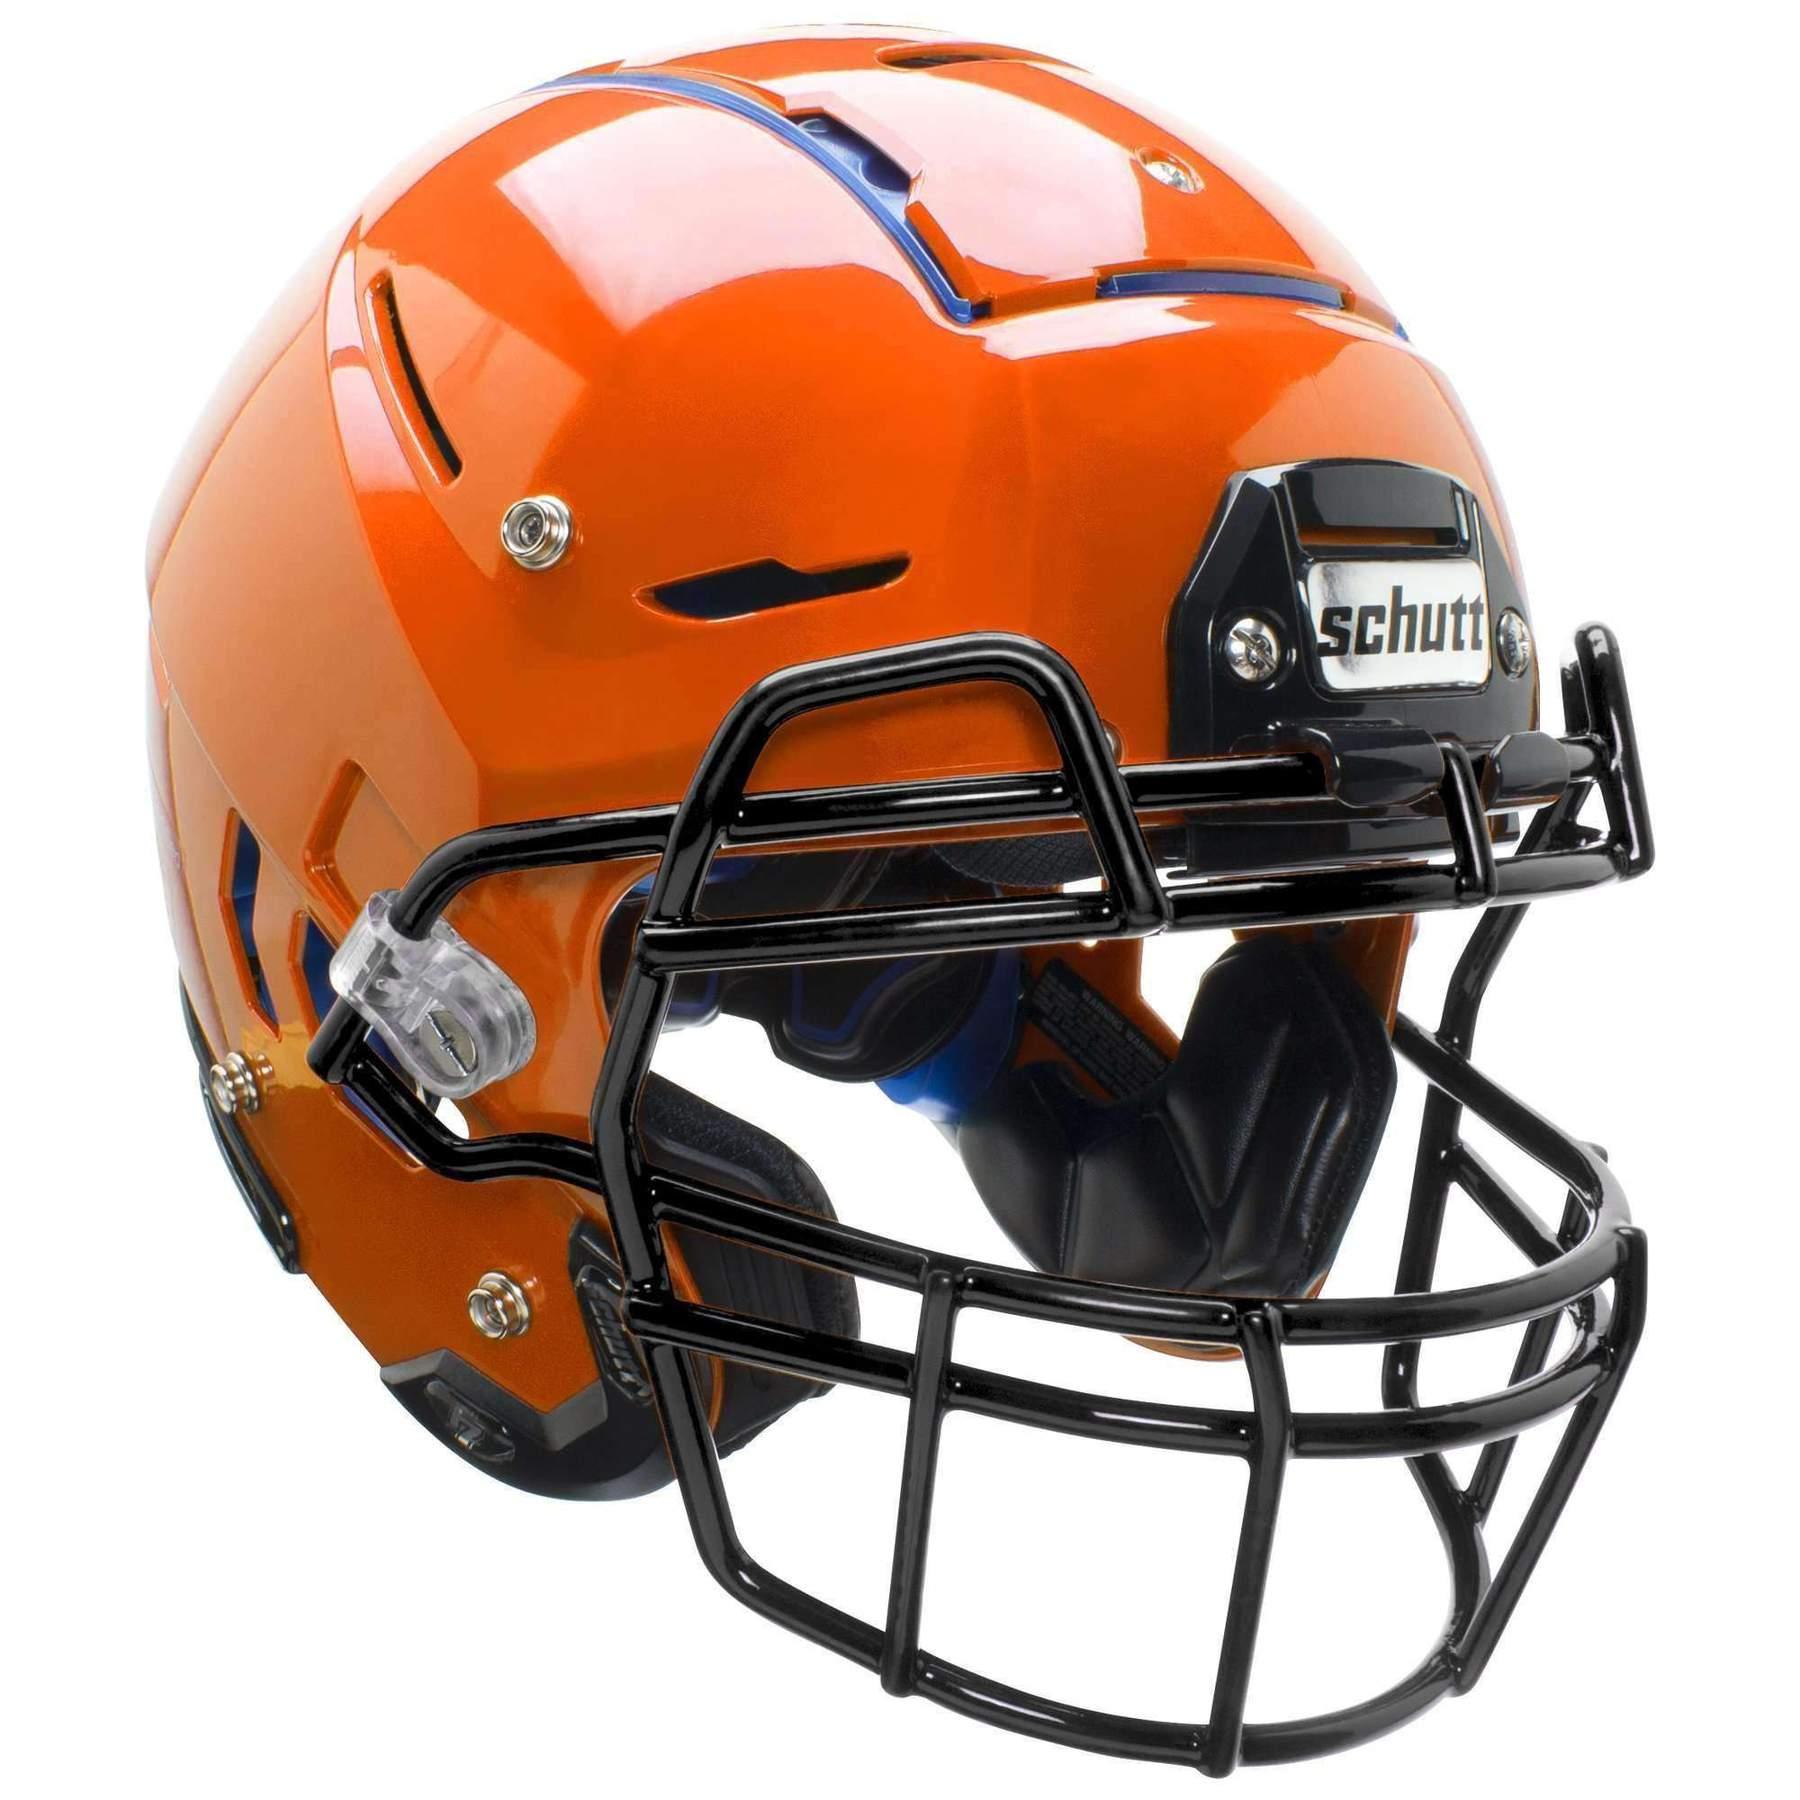 1800x1800 Schutt F7 Adult Football Helmet Helmet For Football League